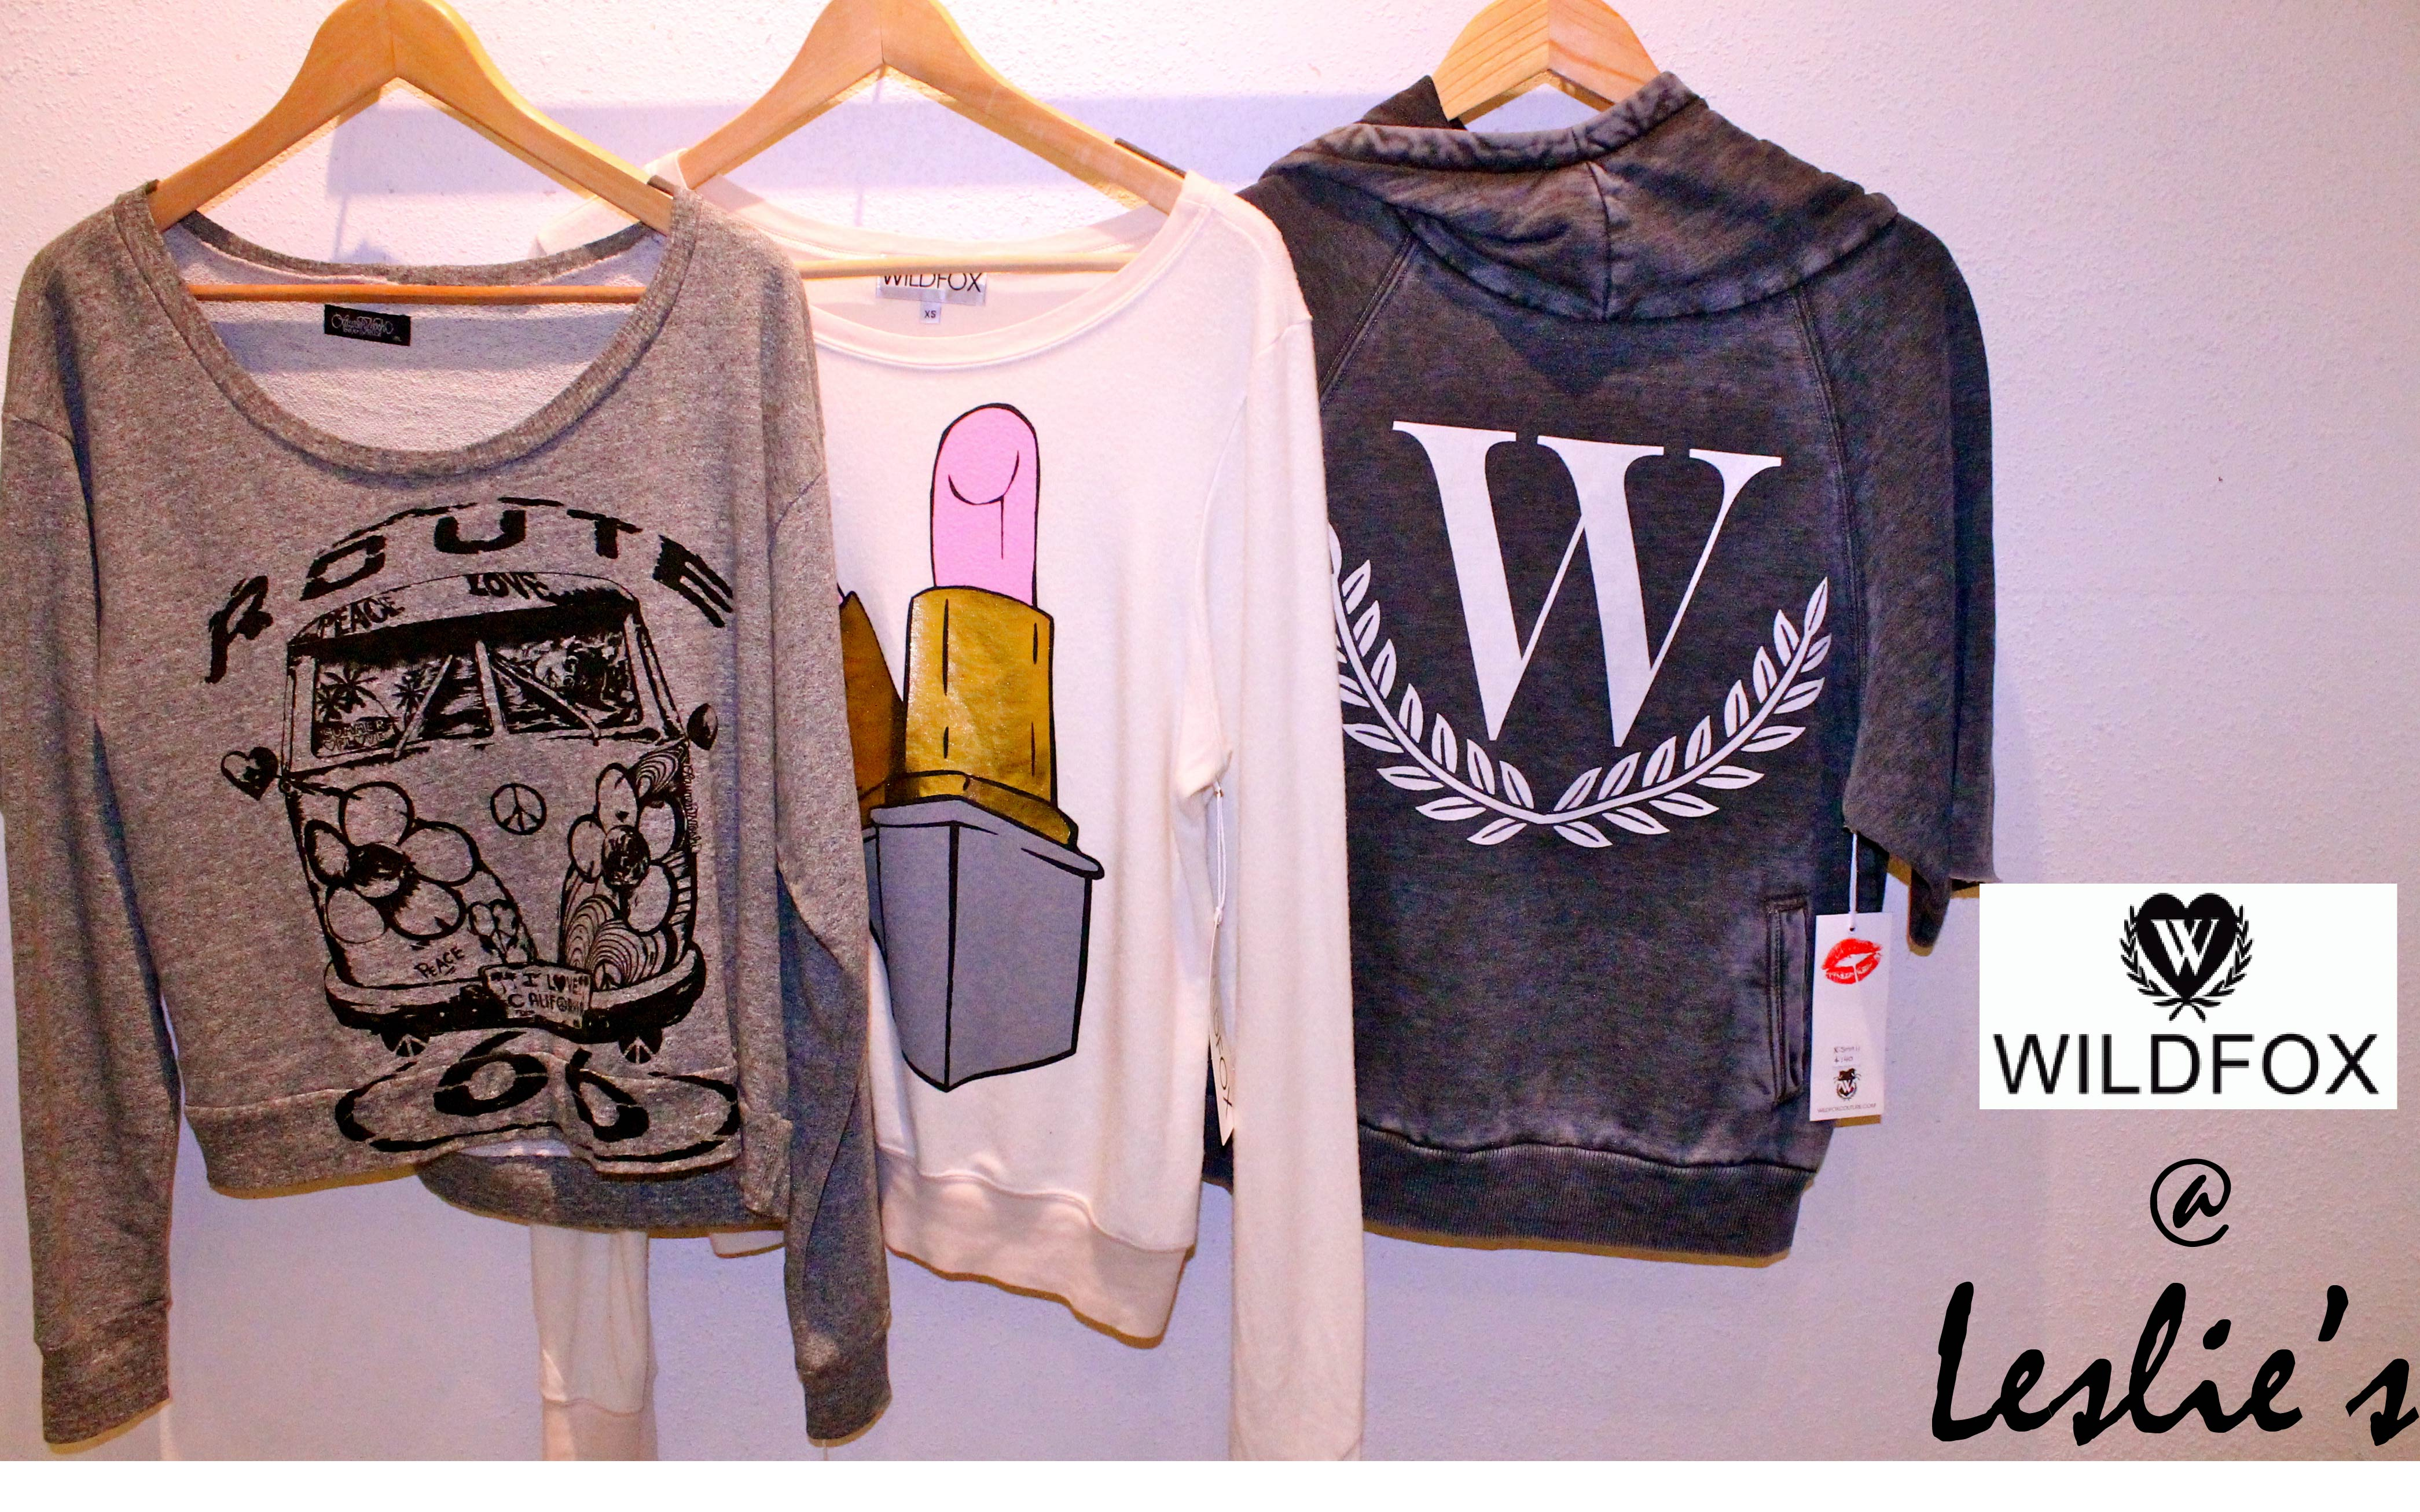 Shirt design london ontario - 2012 Fashion Lauren Moshi Leslie S London Ontario Richmond Row Wild Fox Leave A Comment